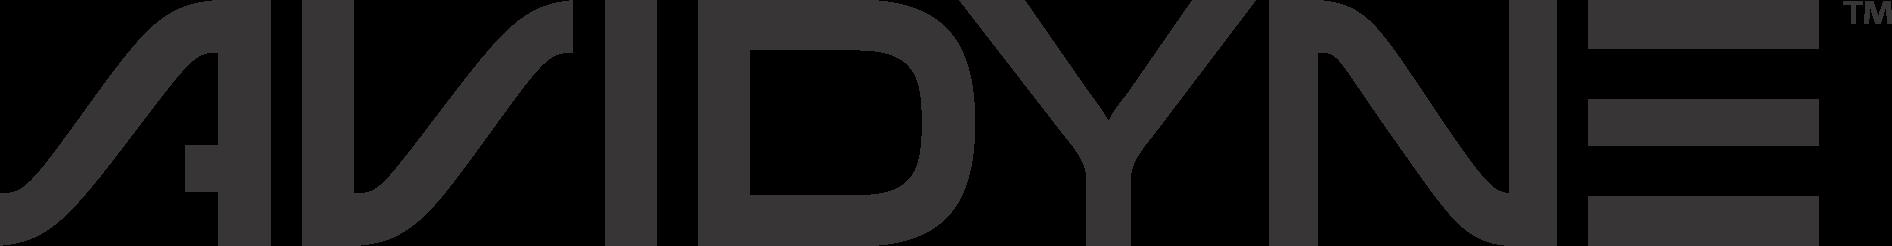 Avidyne-logo-2017.png